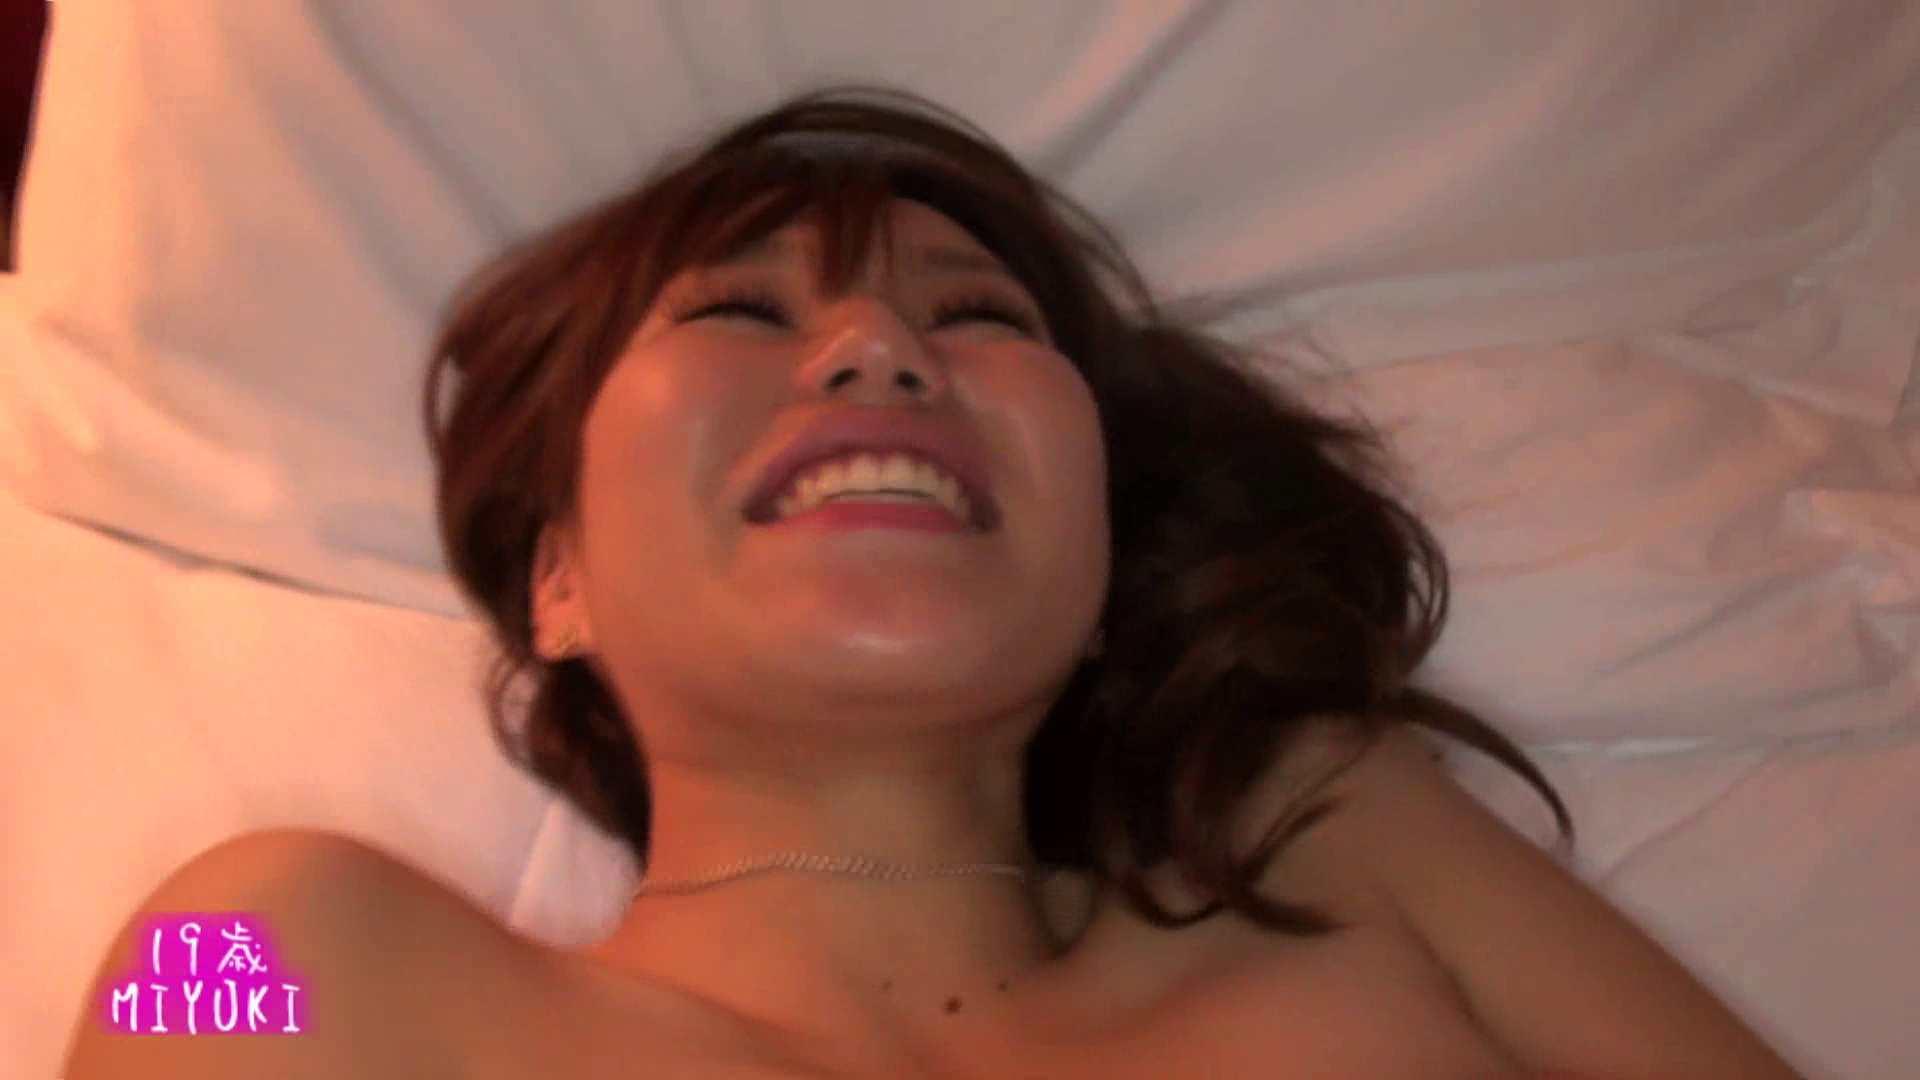 MIYUKIちゃんに男優さんがエロマッサージ 素人  67連発 16